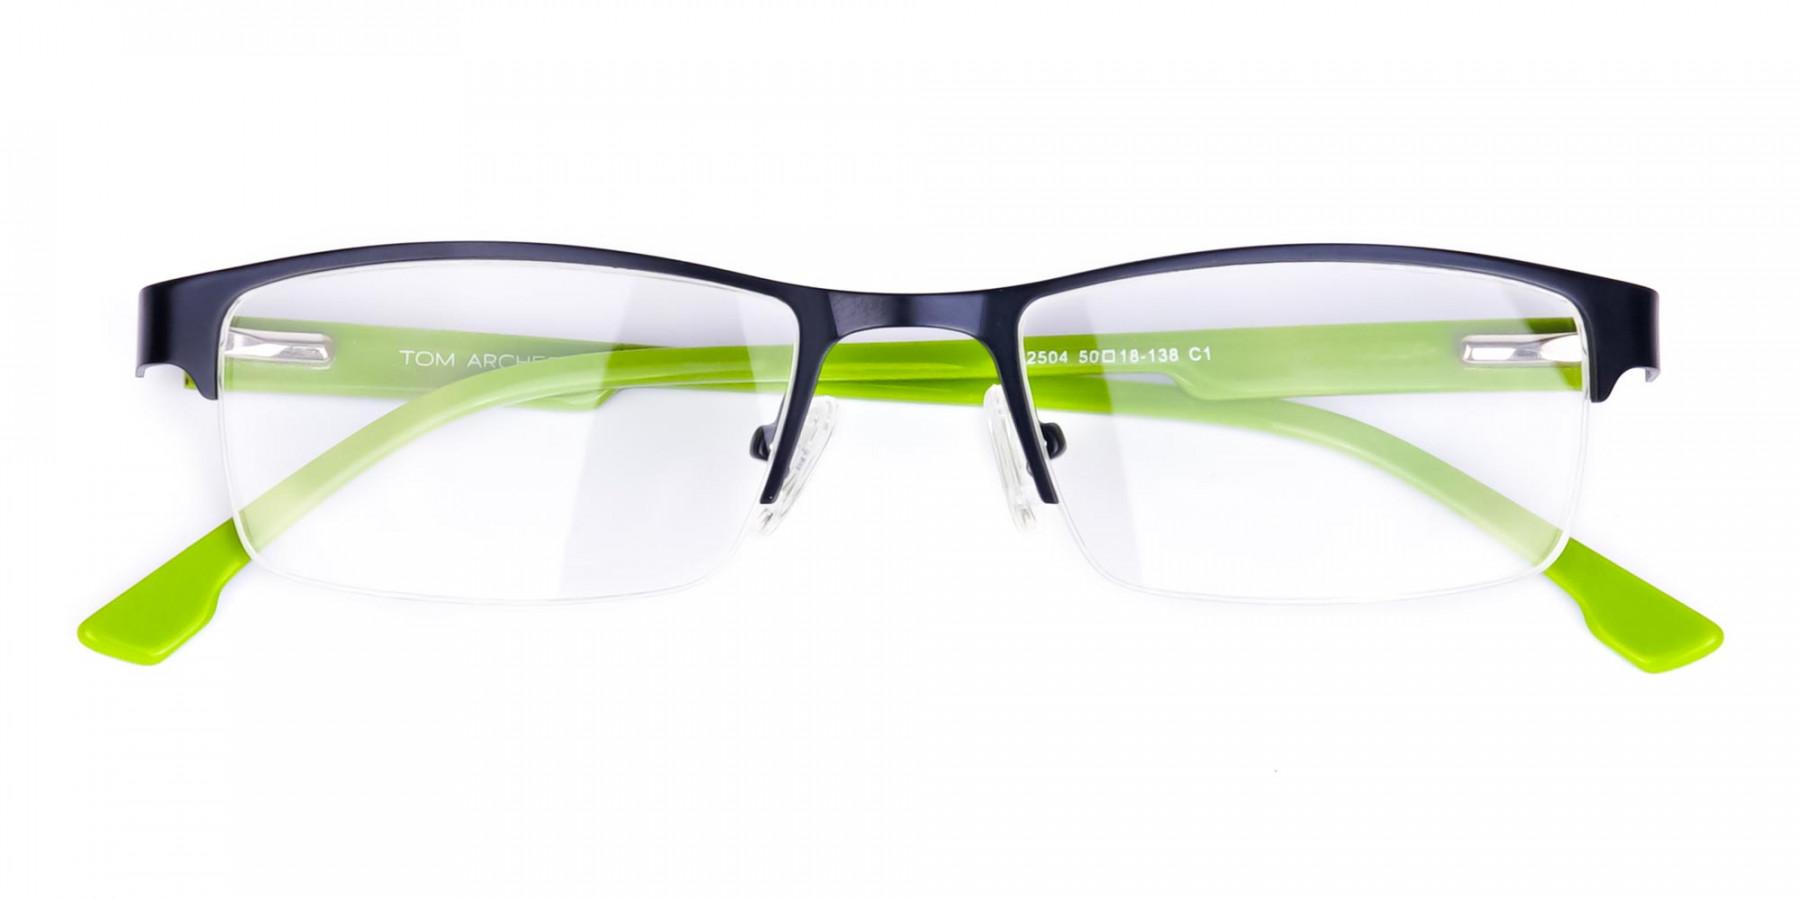 titanium eyeglass frames-1